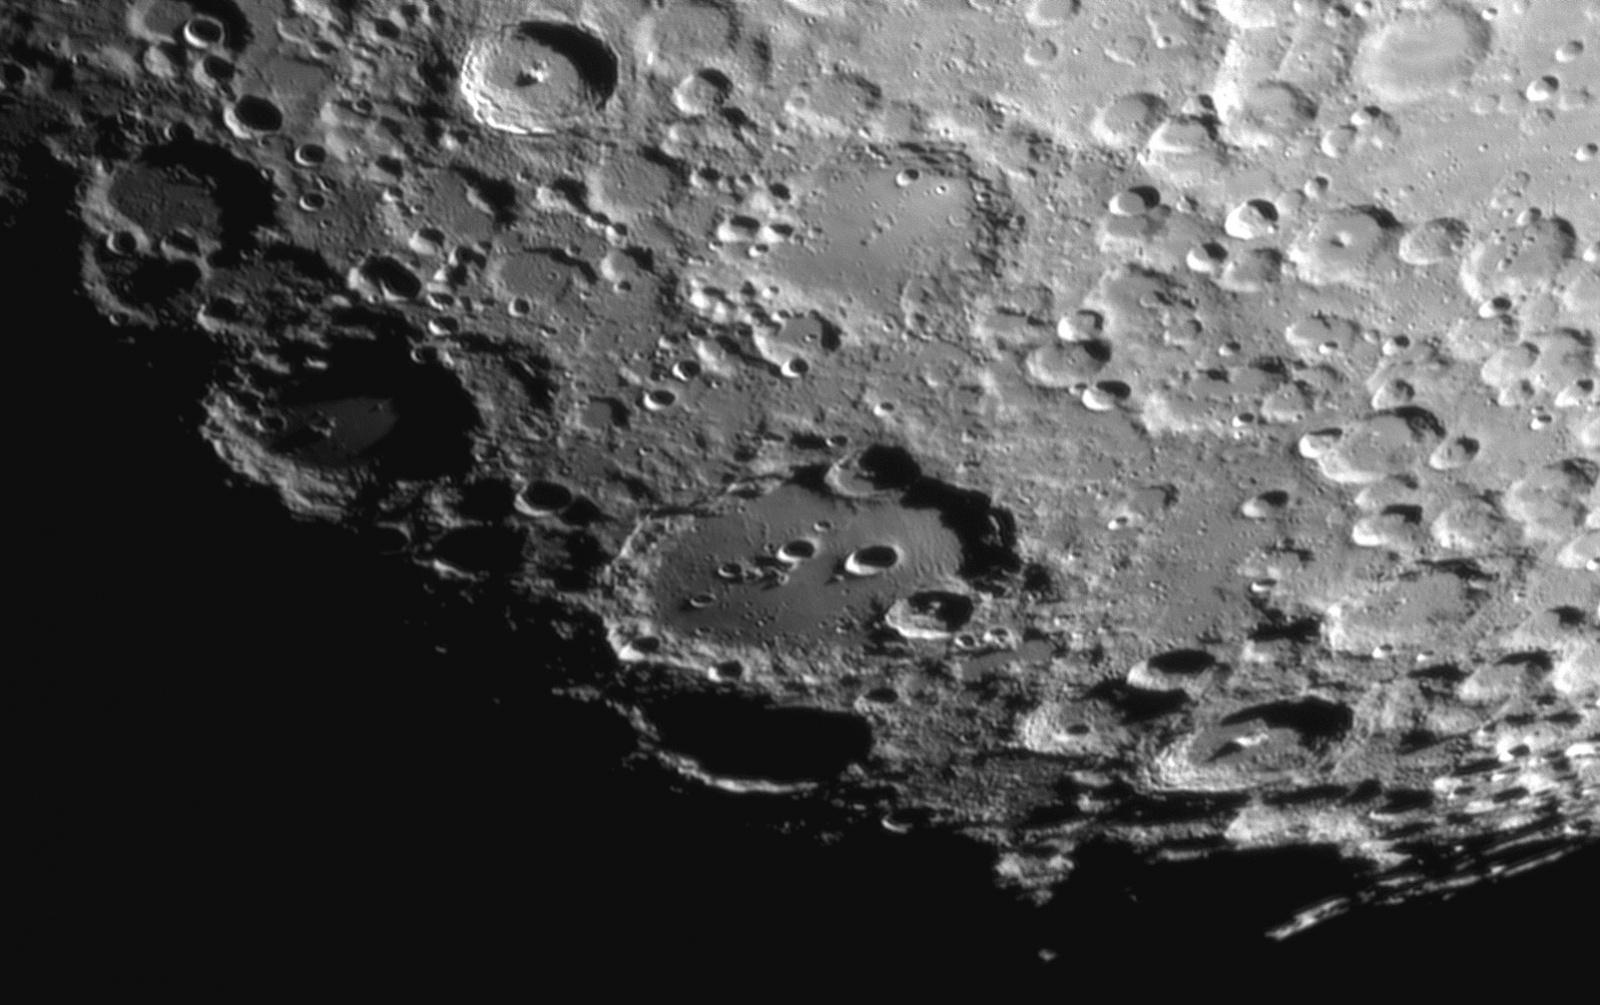 Clavius, Blancanus, Longomontanus 29.07.2020r_22.06_MAK150F1800_ASI290MM_IR.pas685nm_105%....jpg